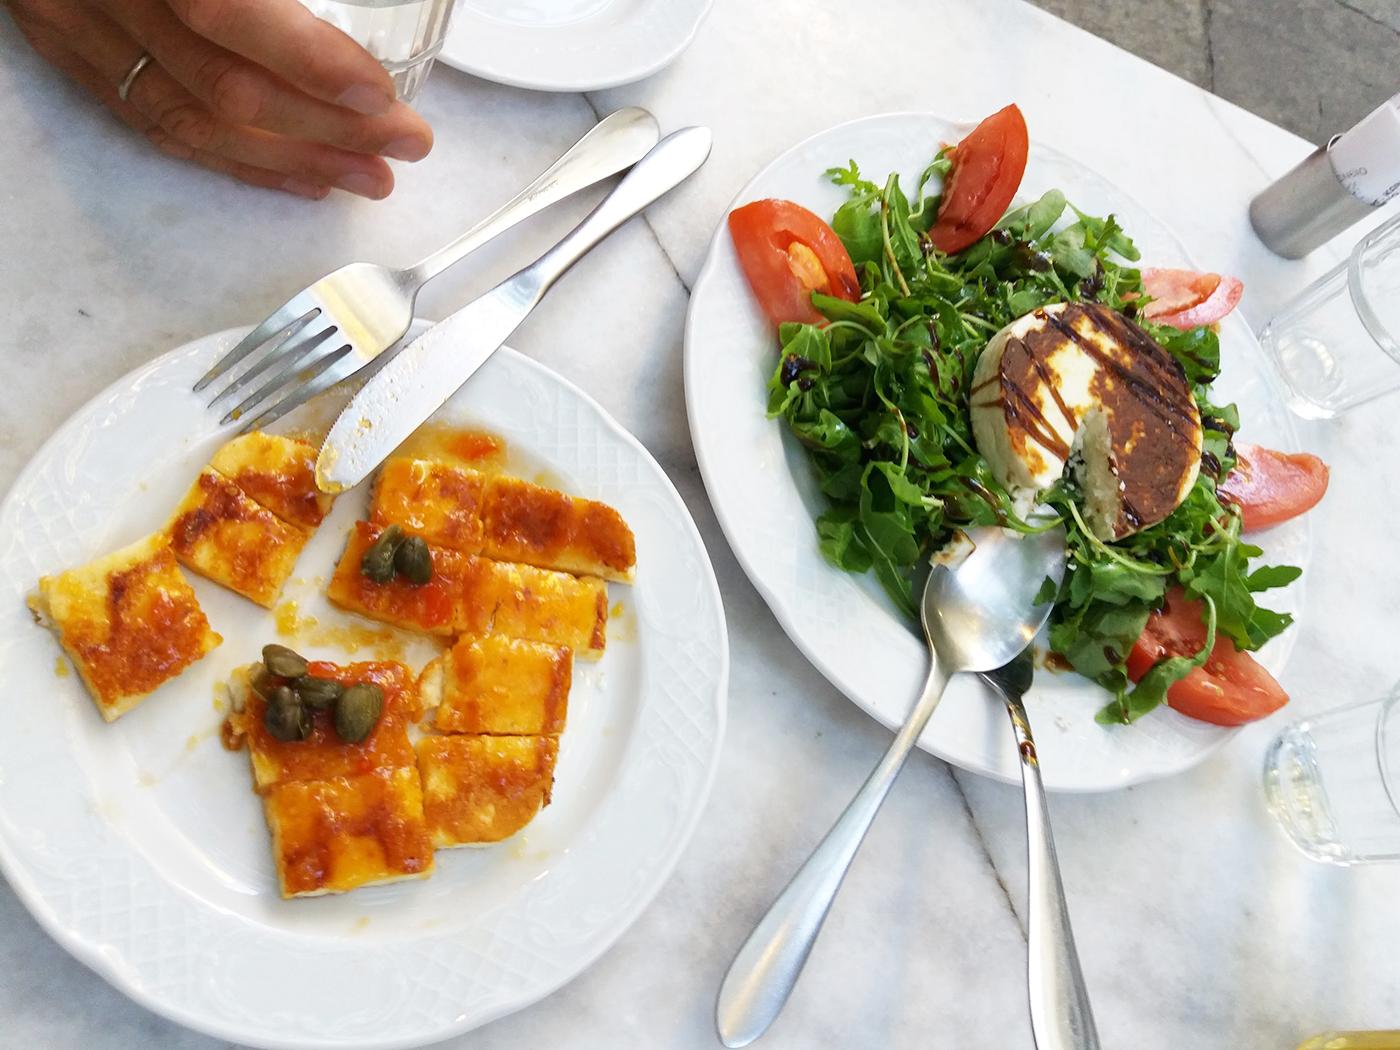 Op culinair gebied zit je in Griekenland helemaal goed!